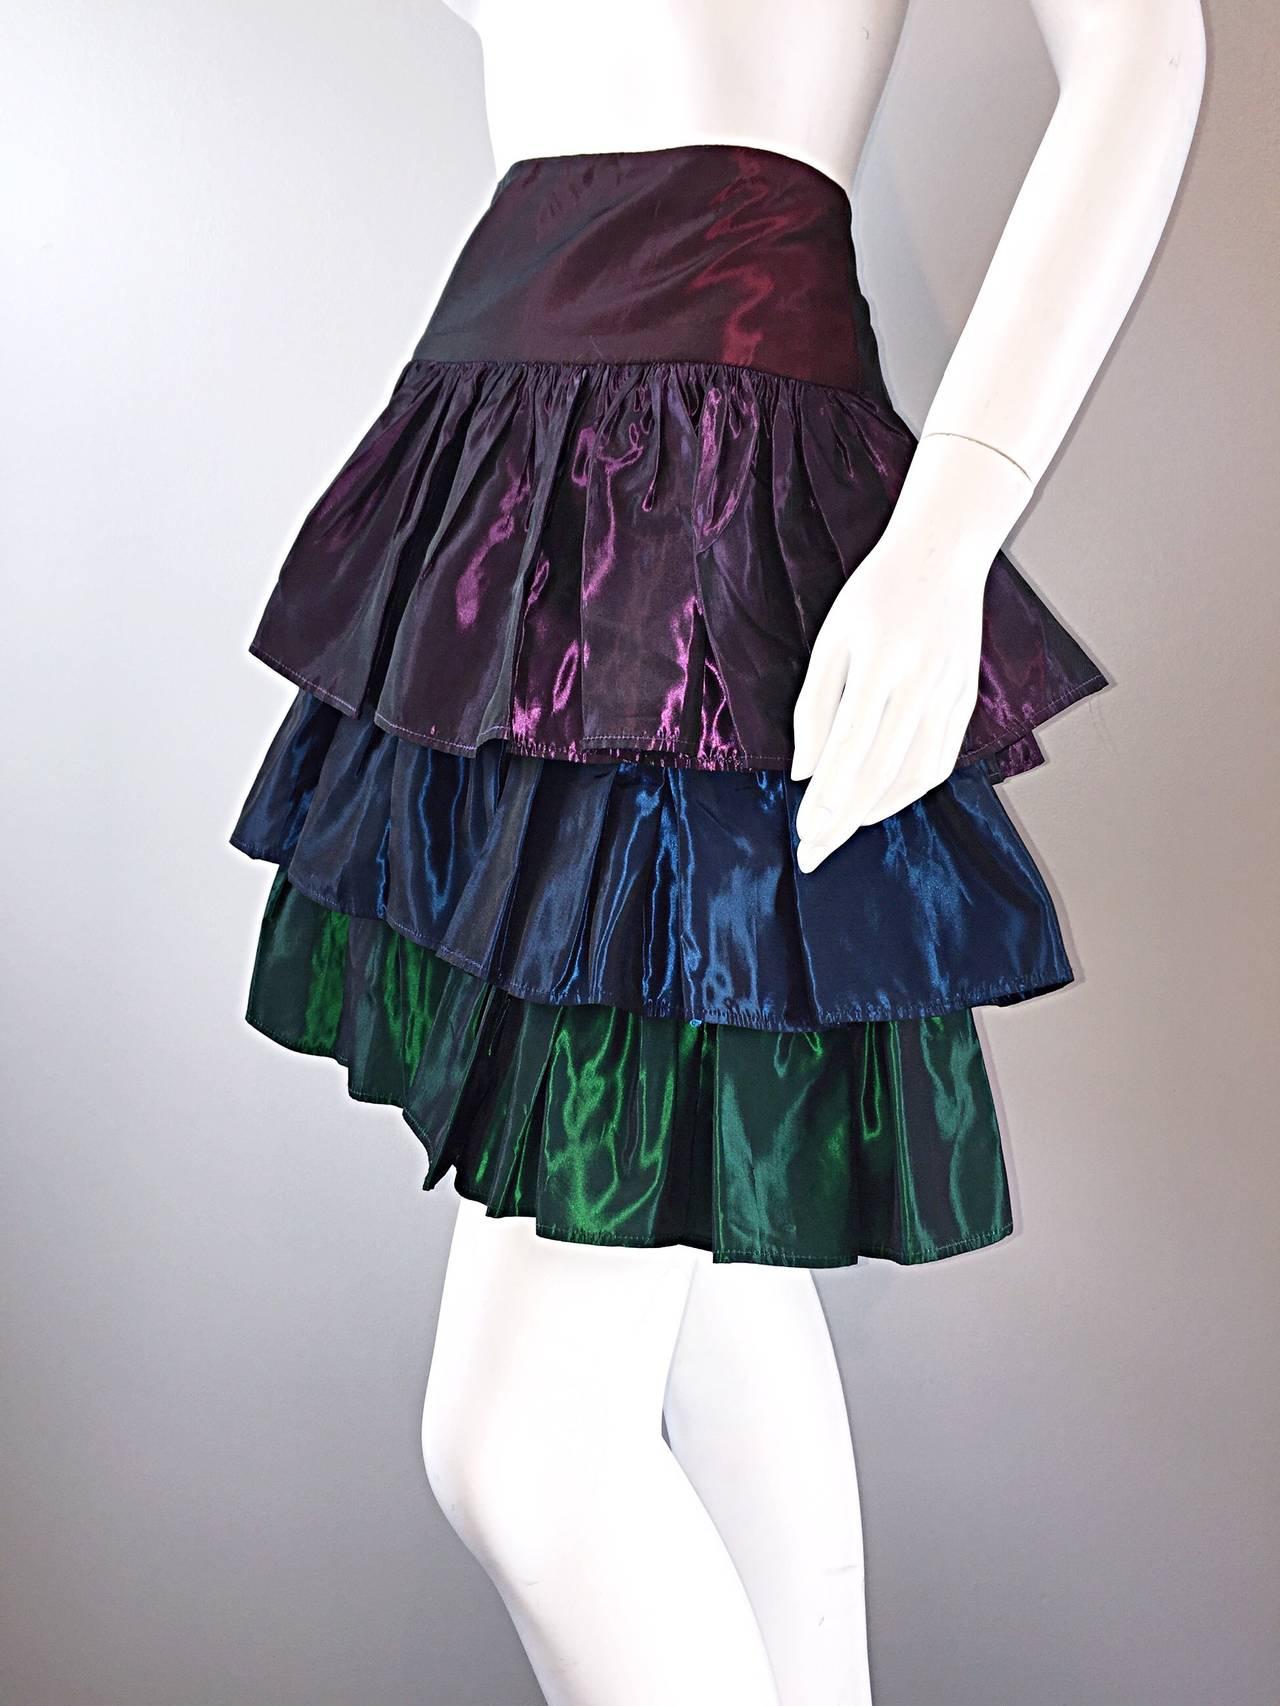 Kalinka For Bergdorf Goodman Tiered Taffeta ' Rainbow ' Vintage Skirt 4